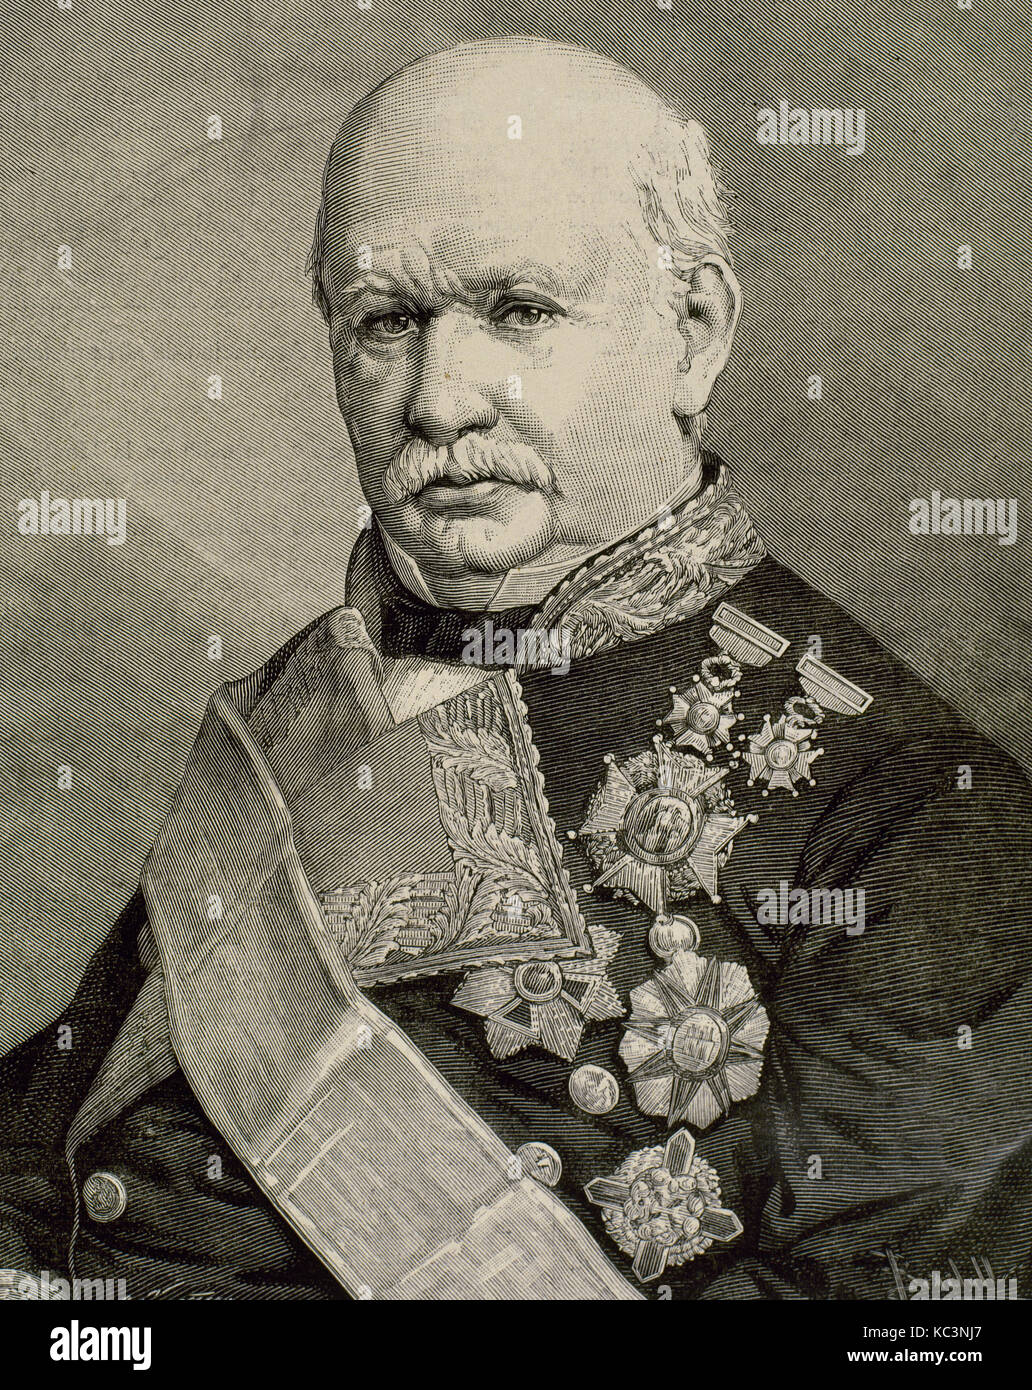 Don Fernando Fernández de Córdoba y valcárcel, 2a Marchese di mendigorría (1809-1883). esercito Immagini Stock